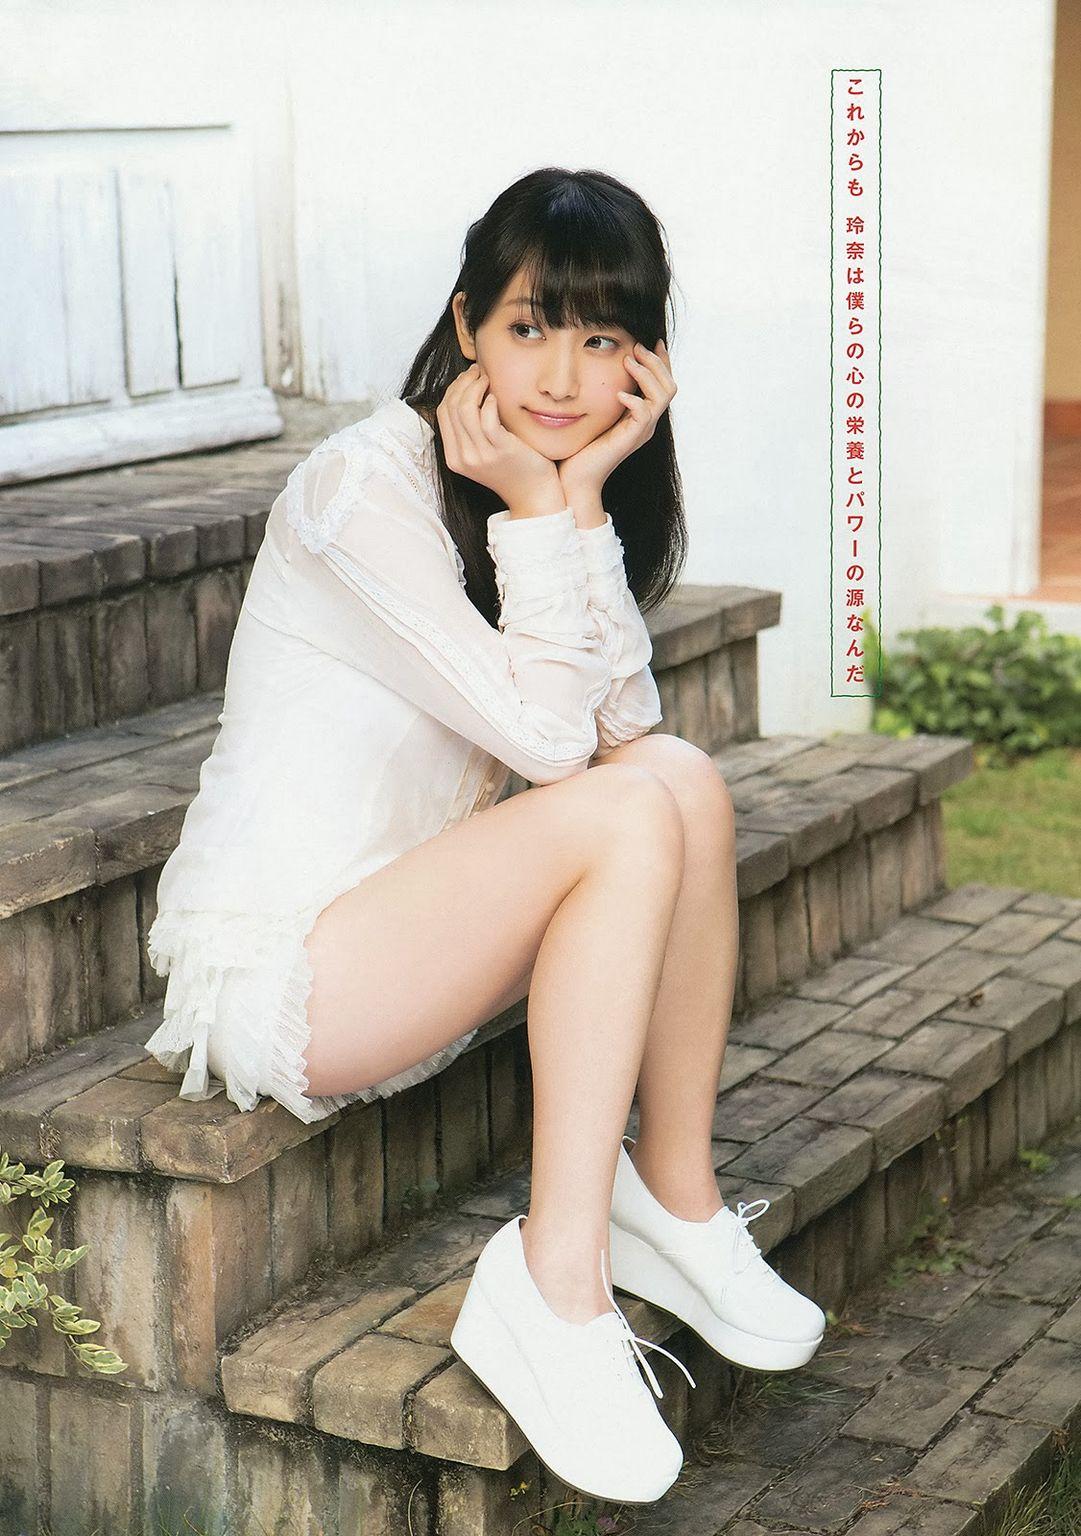 SKE48 Rena Matsui Tomato on Young Animal Magazine 007.jpg